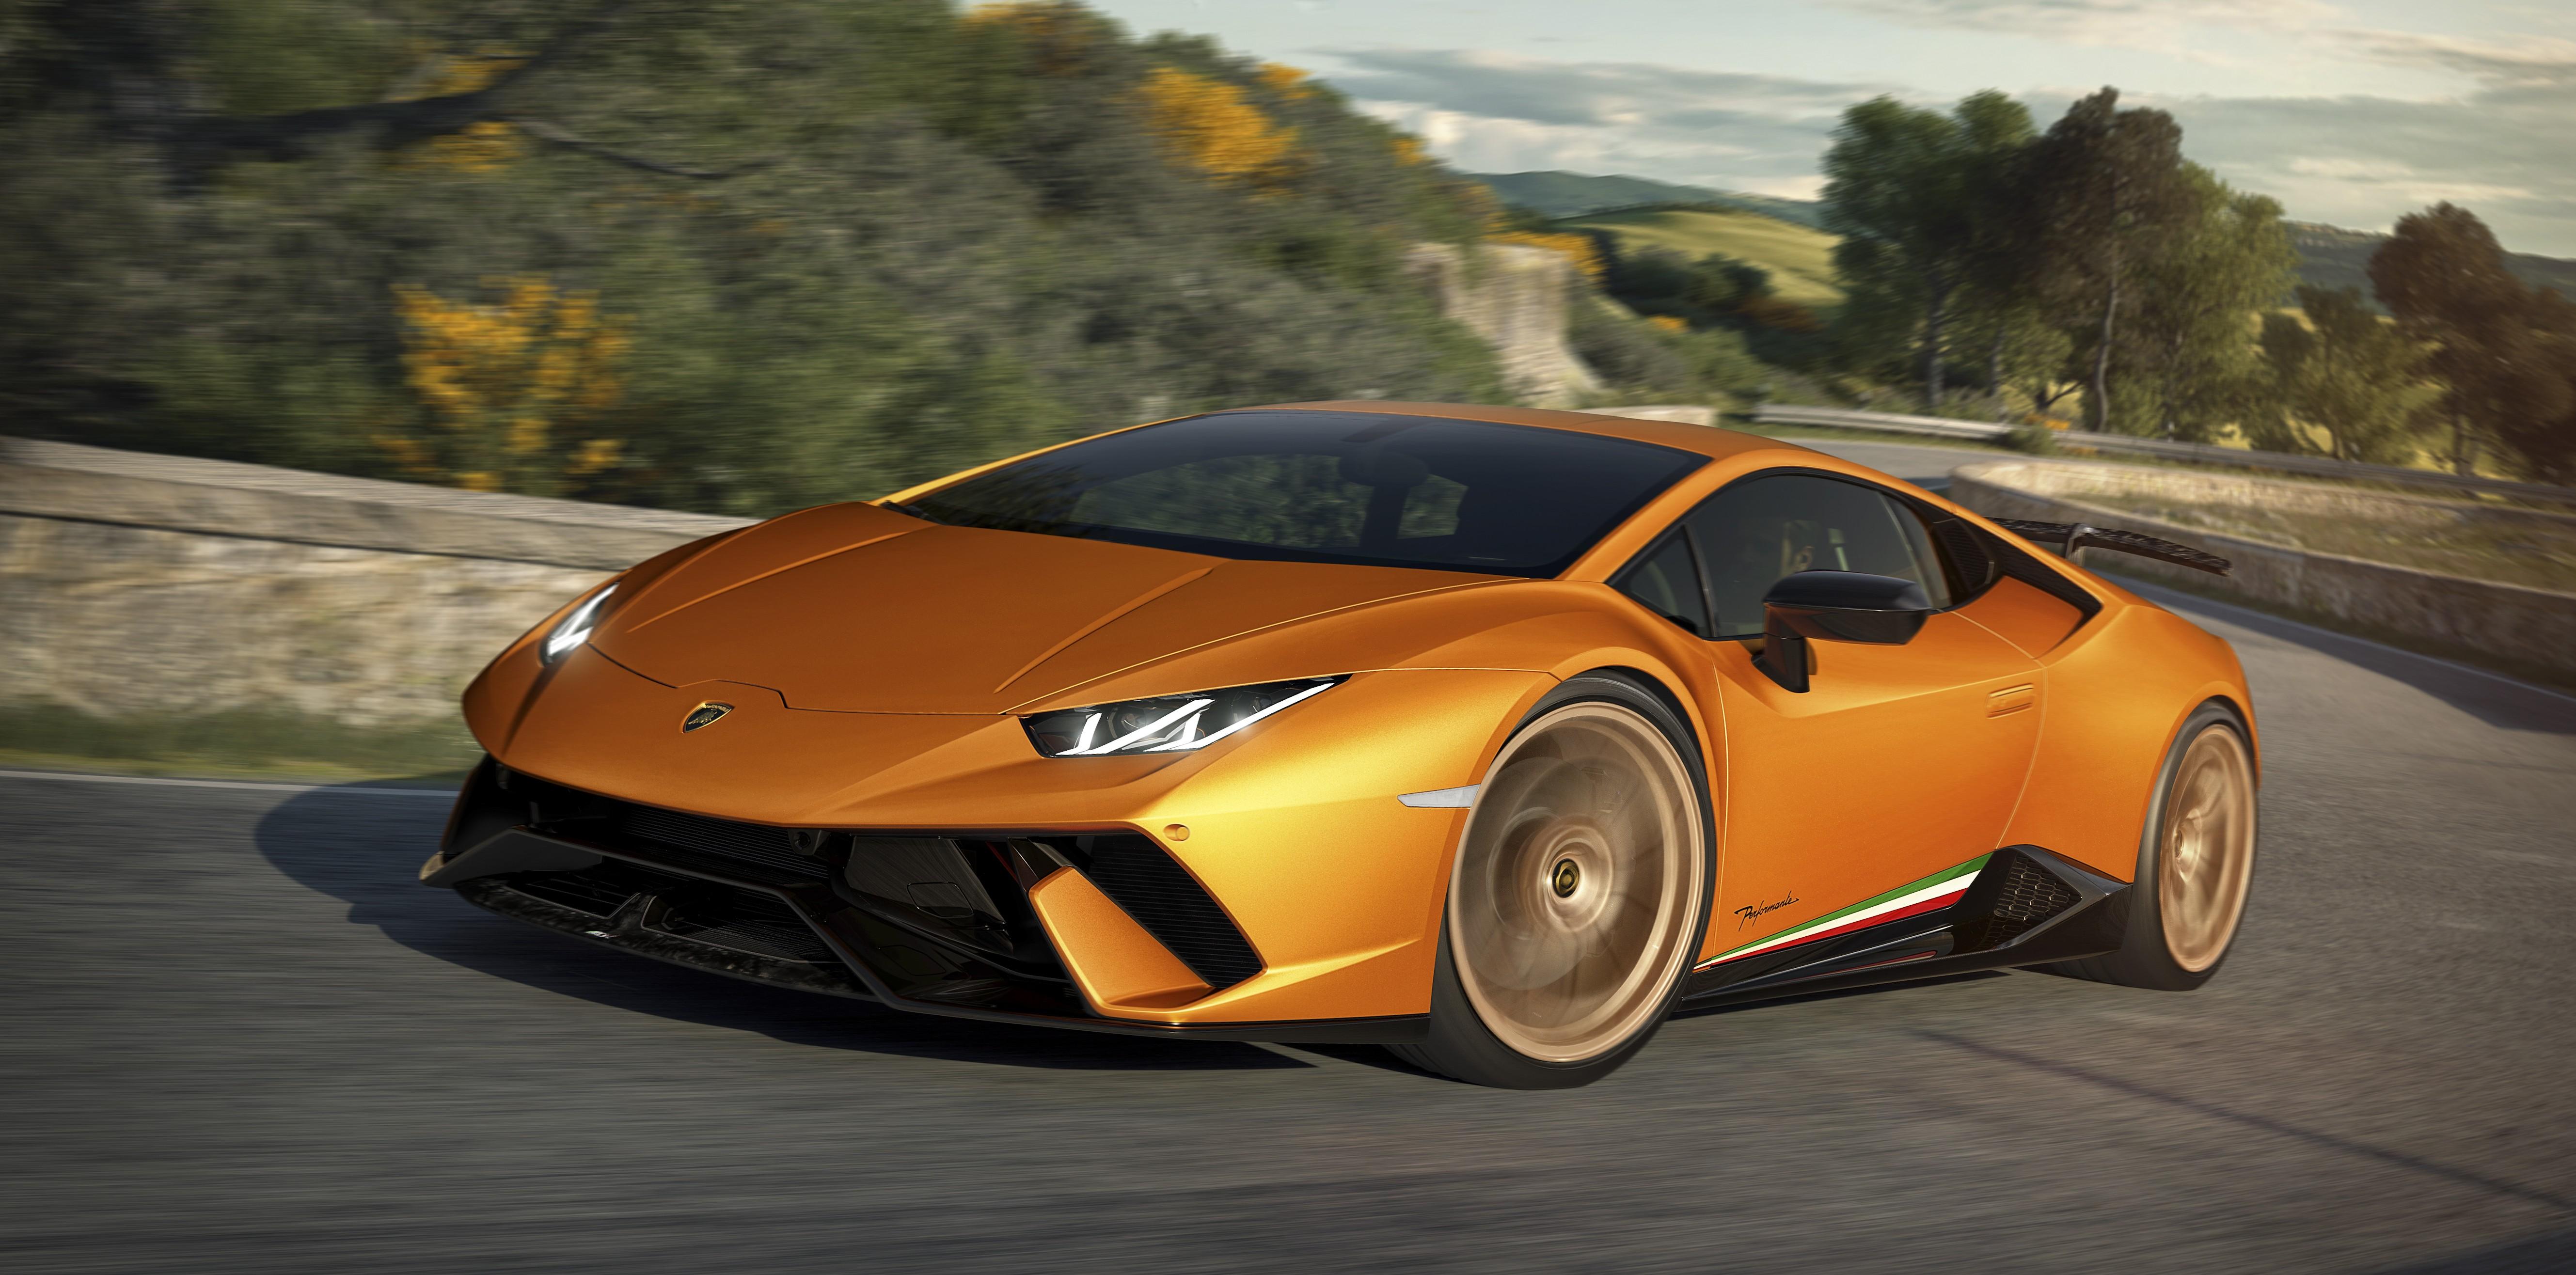 2019 Lamborghini Huracan Expected To Get Rear Wheel Steering